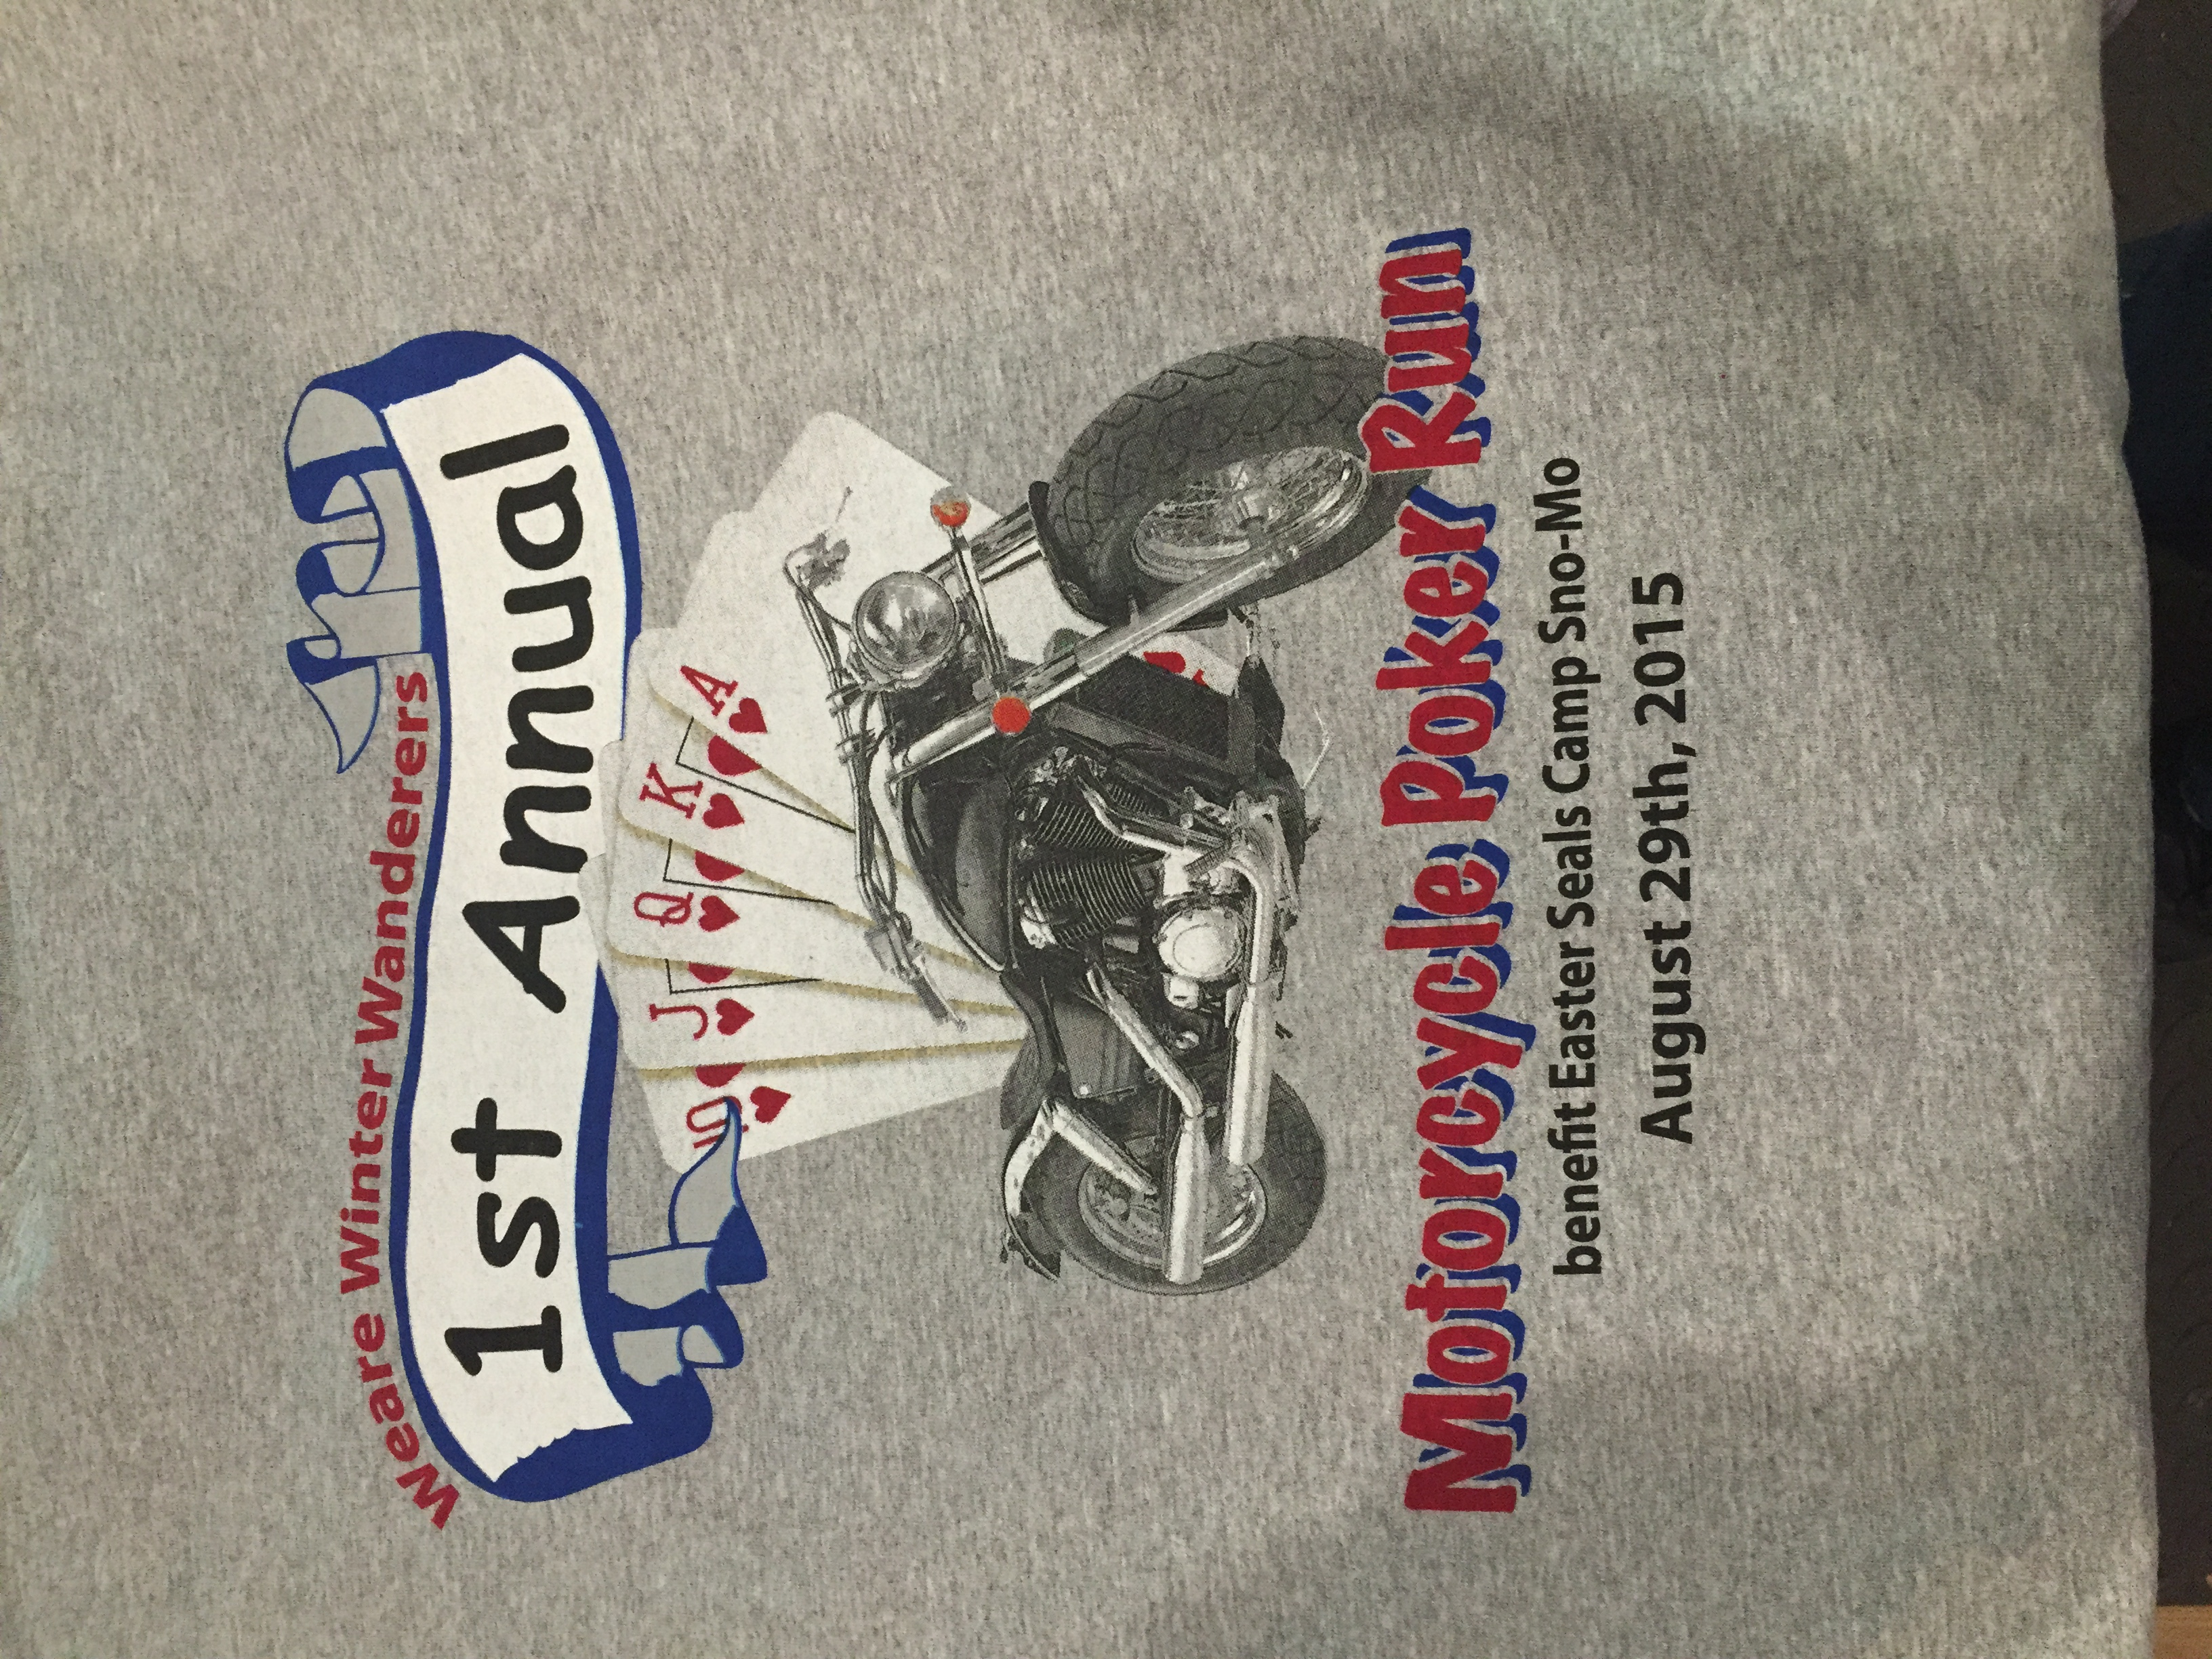 Were Winter Wanderers Motorcycle Run